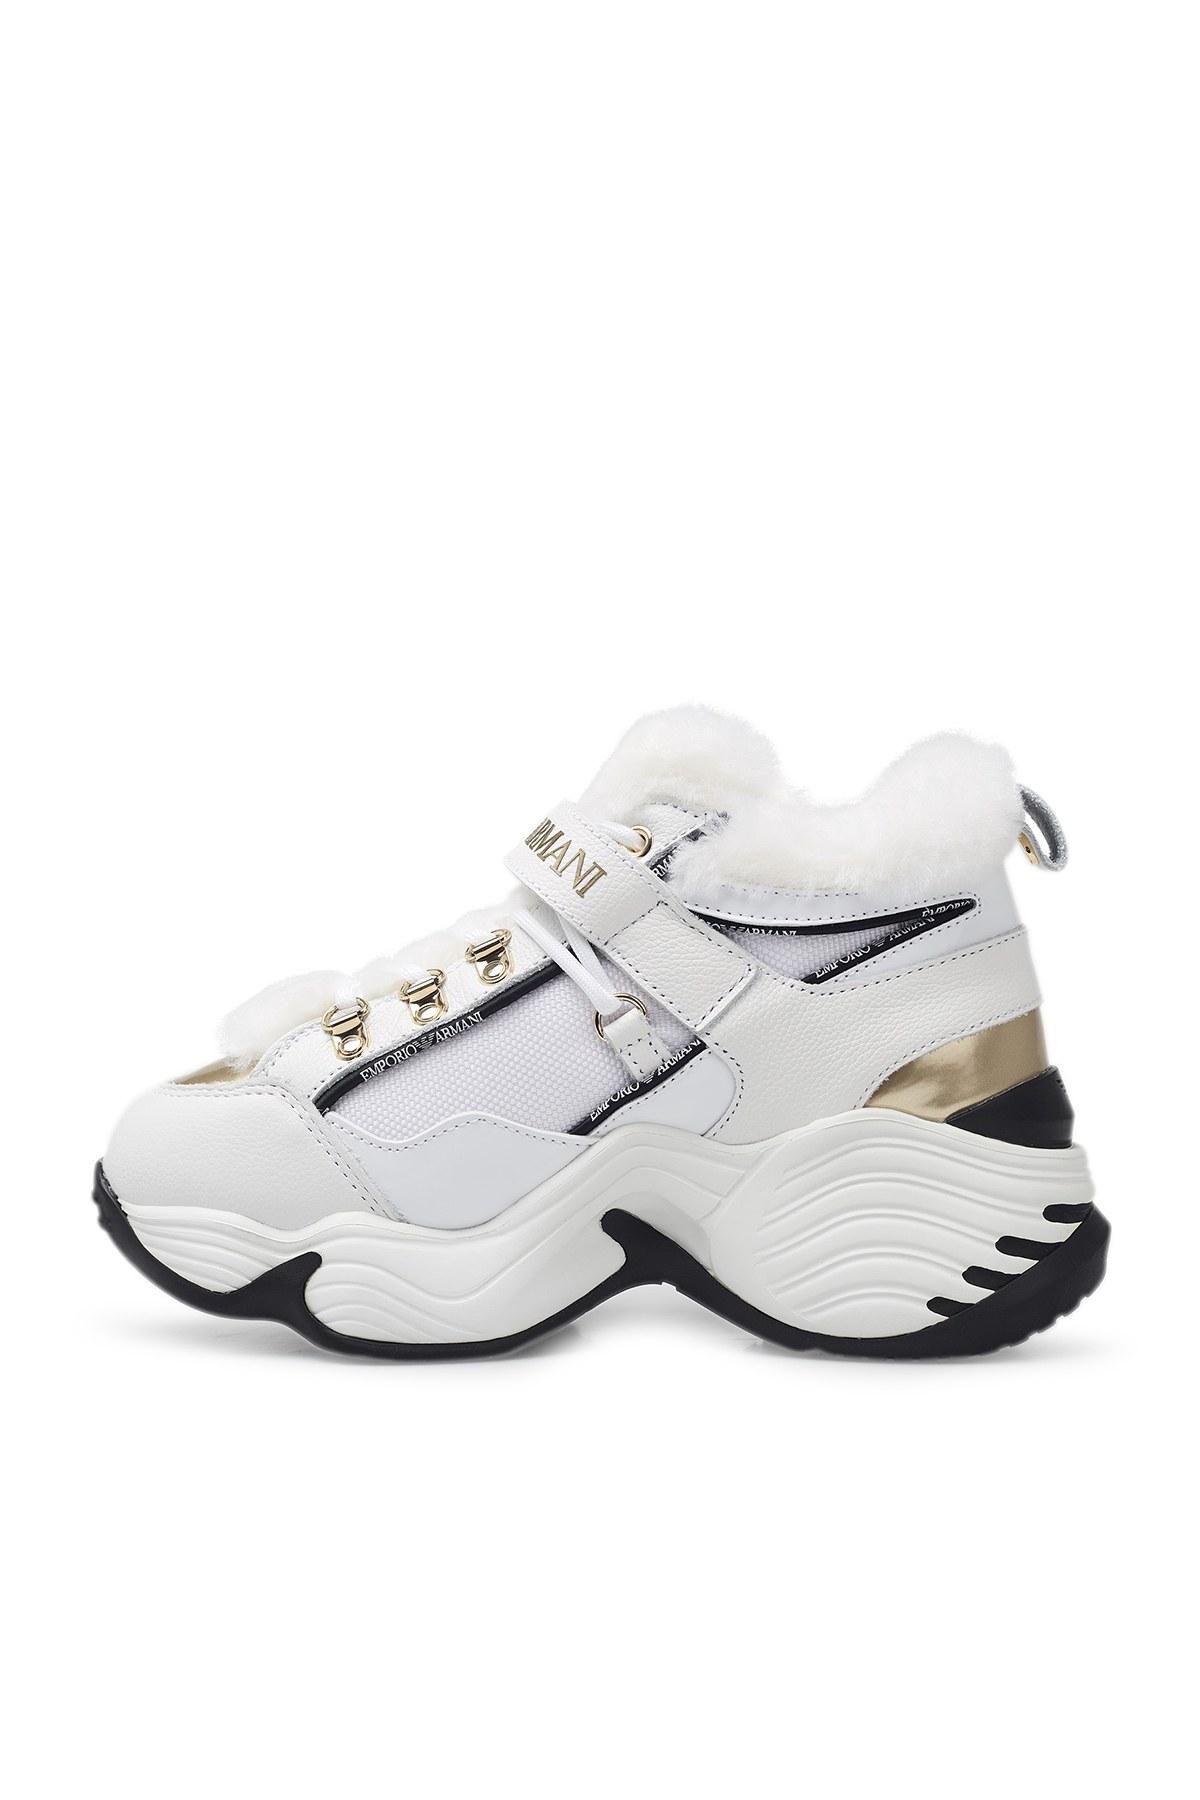 Emporio Armani Bayan Ayakkabı X3X122 XM538 N186 BEYAZ